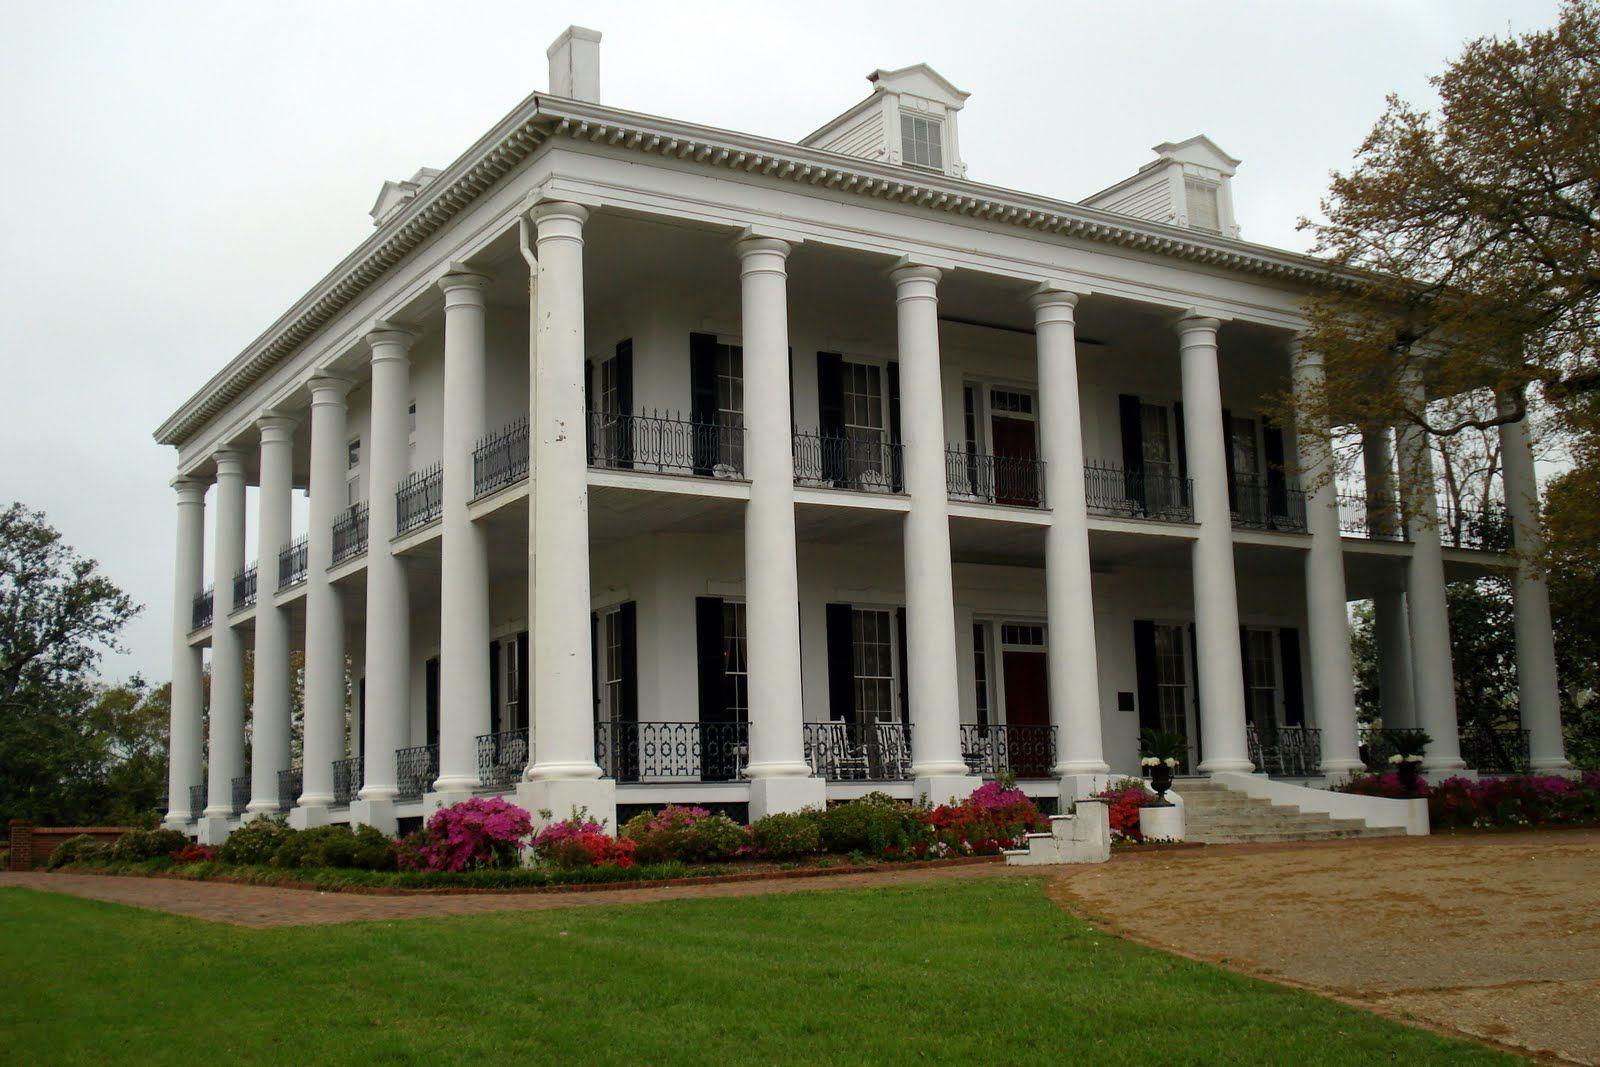 Mississippi Antebellum Plantation Homes This plantation